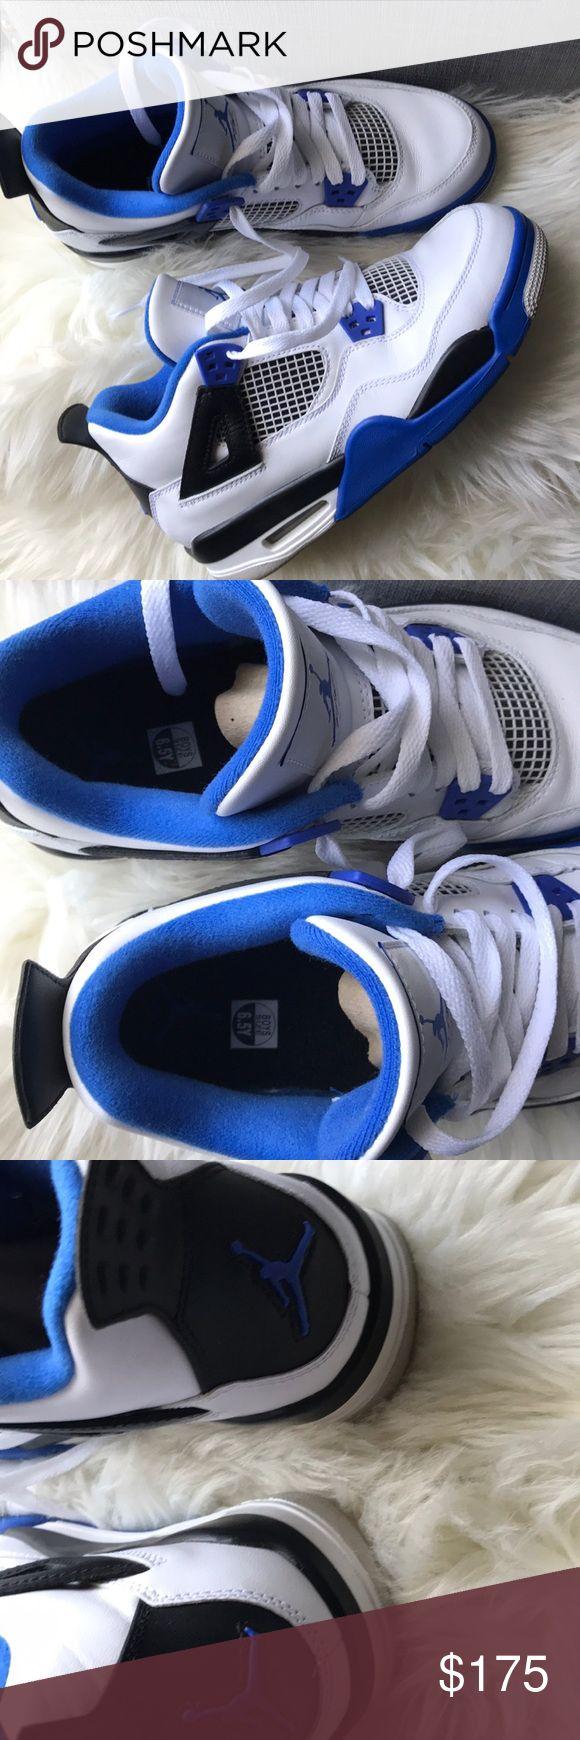 Jordan retro 4 white blue black shoes without box. Size 6